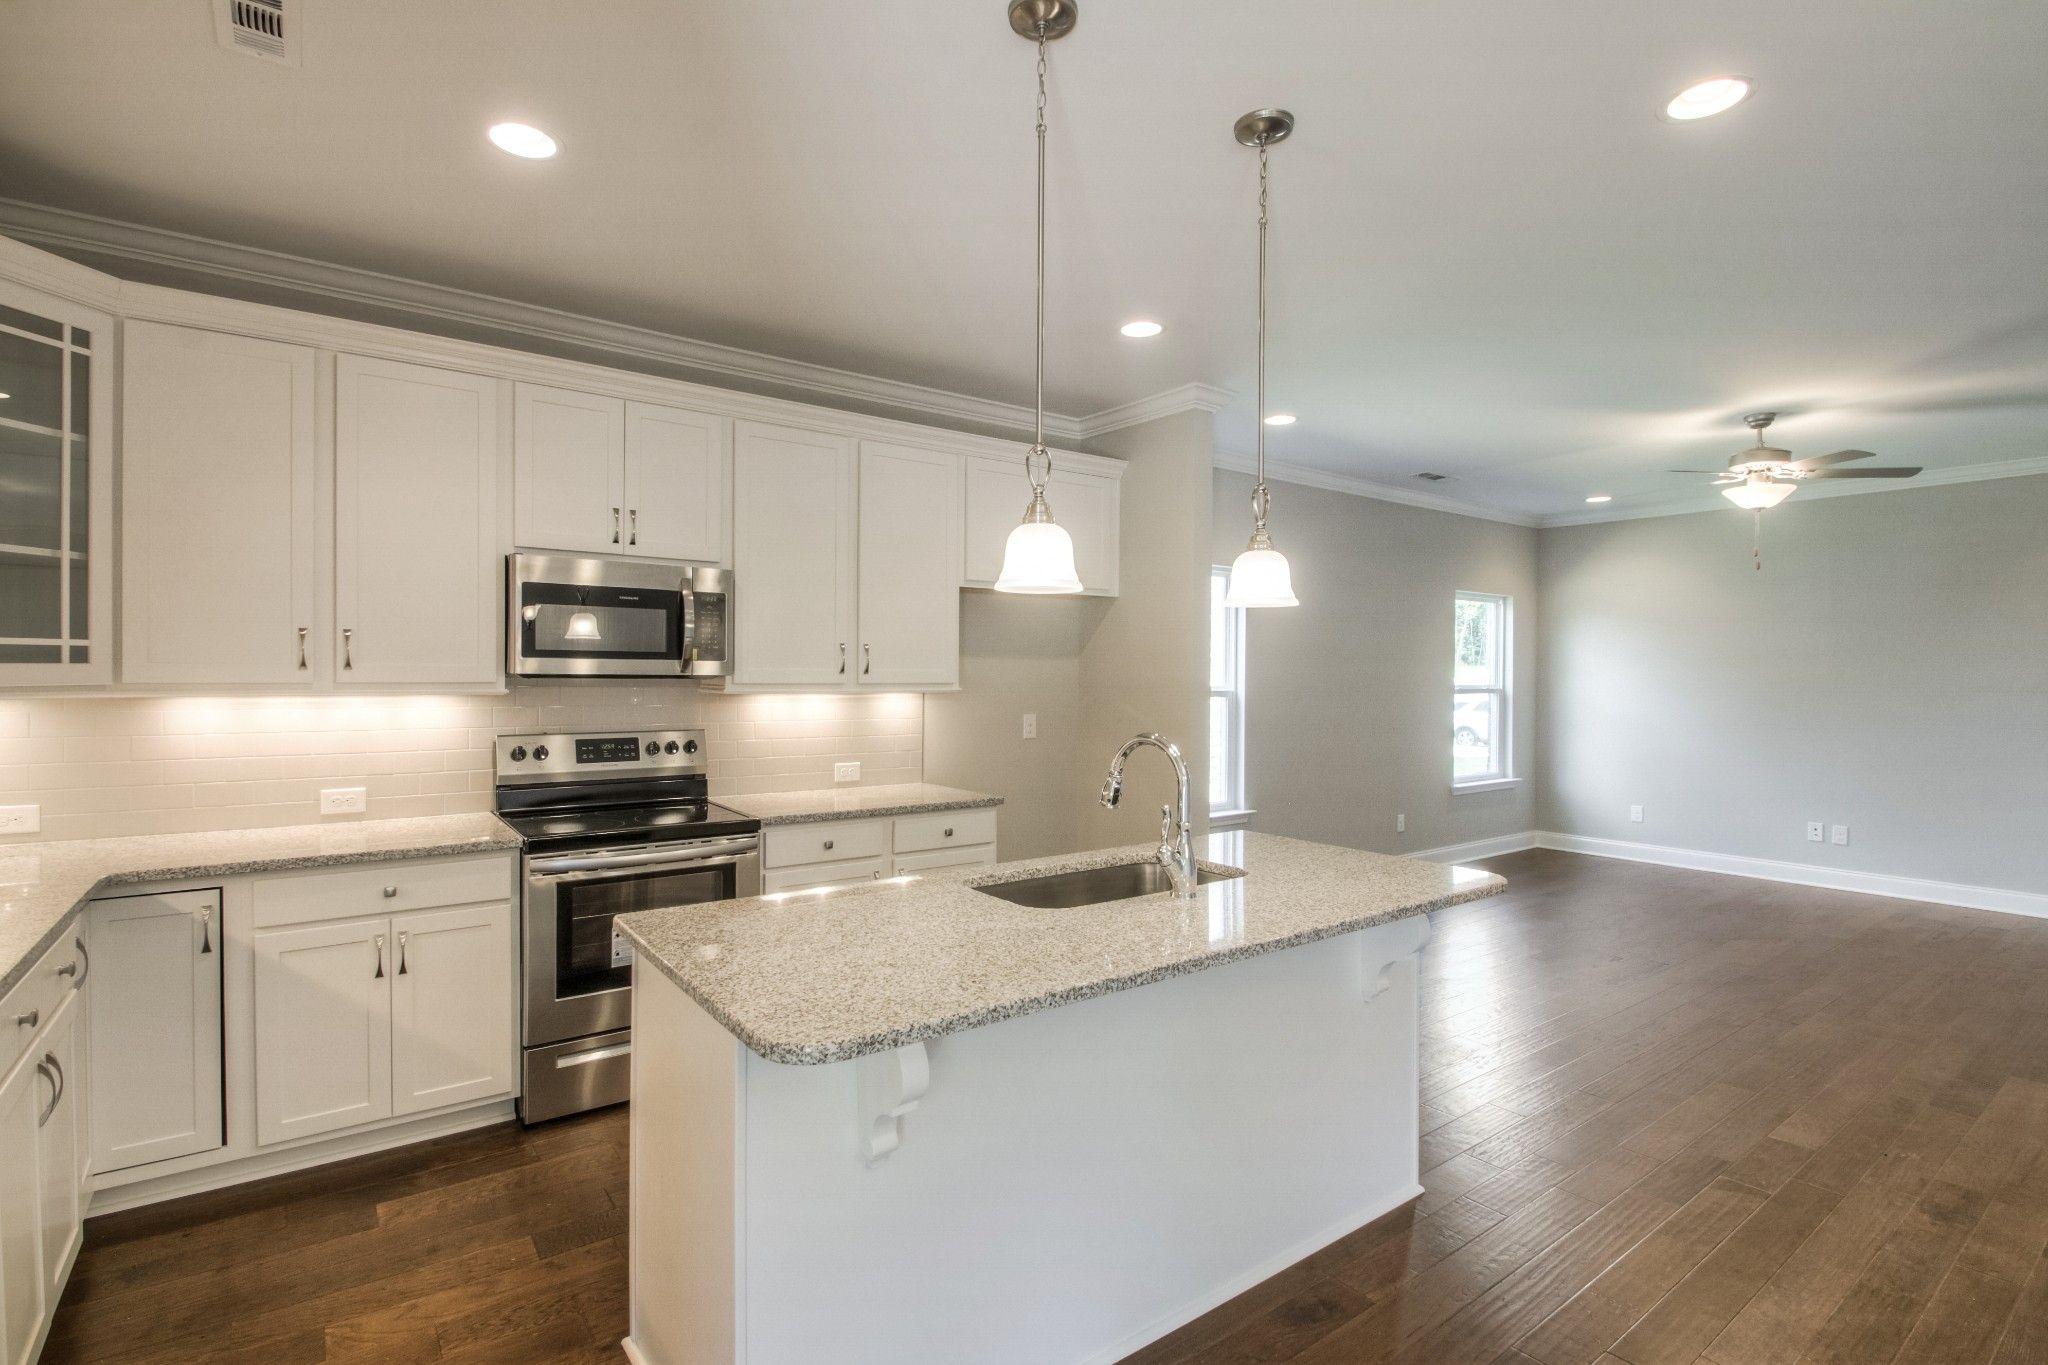 Kitchen featured in The Ridgemont By Goodall Homes in Nashville, TN